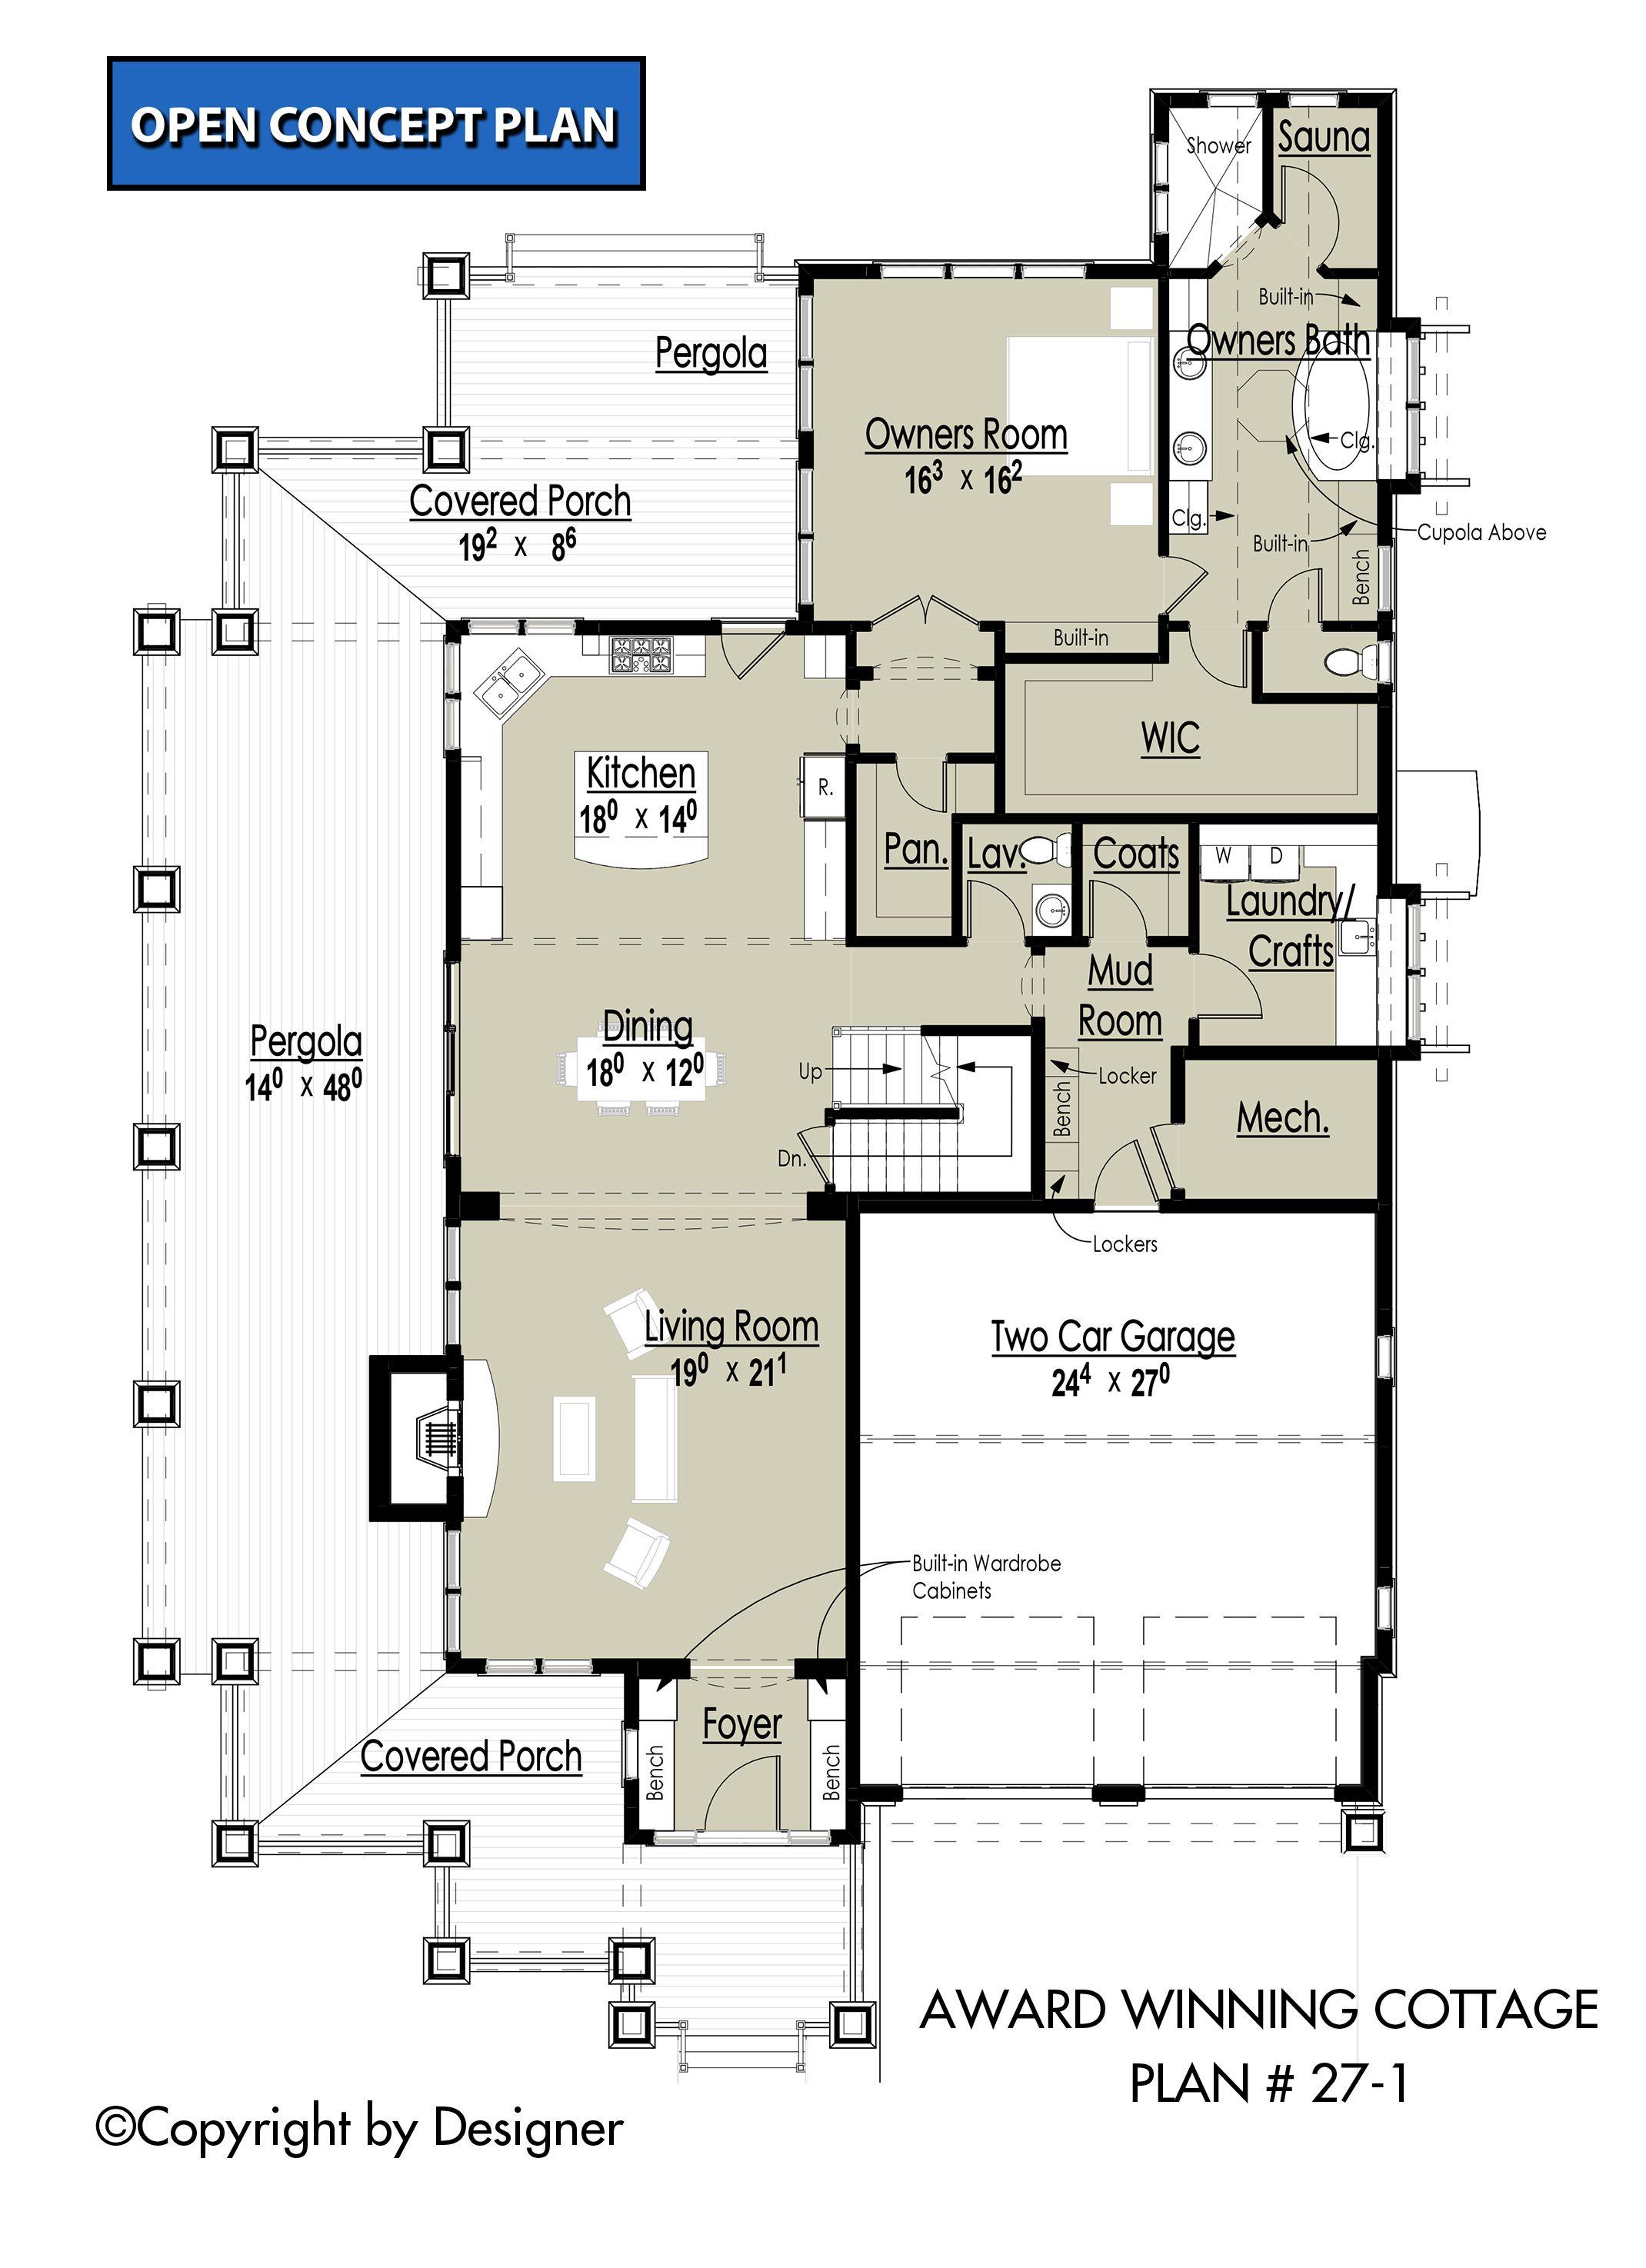 Award Winning Cottage House Plan 27 1 Garrell Associates Inc House Porch Design Cottage House Plans Floor Plans